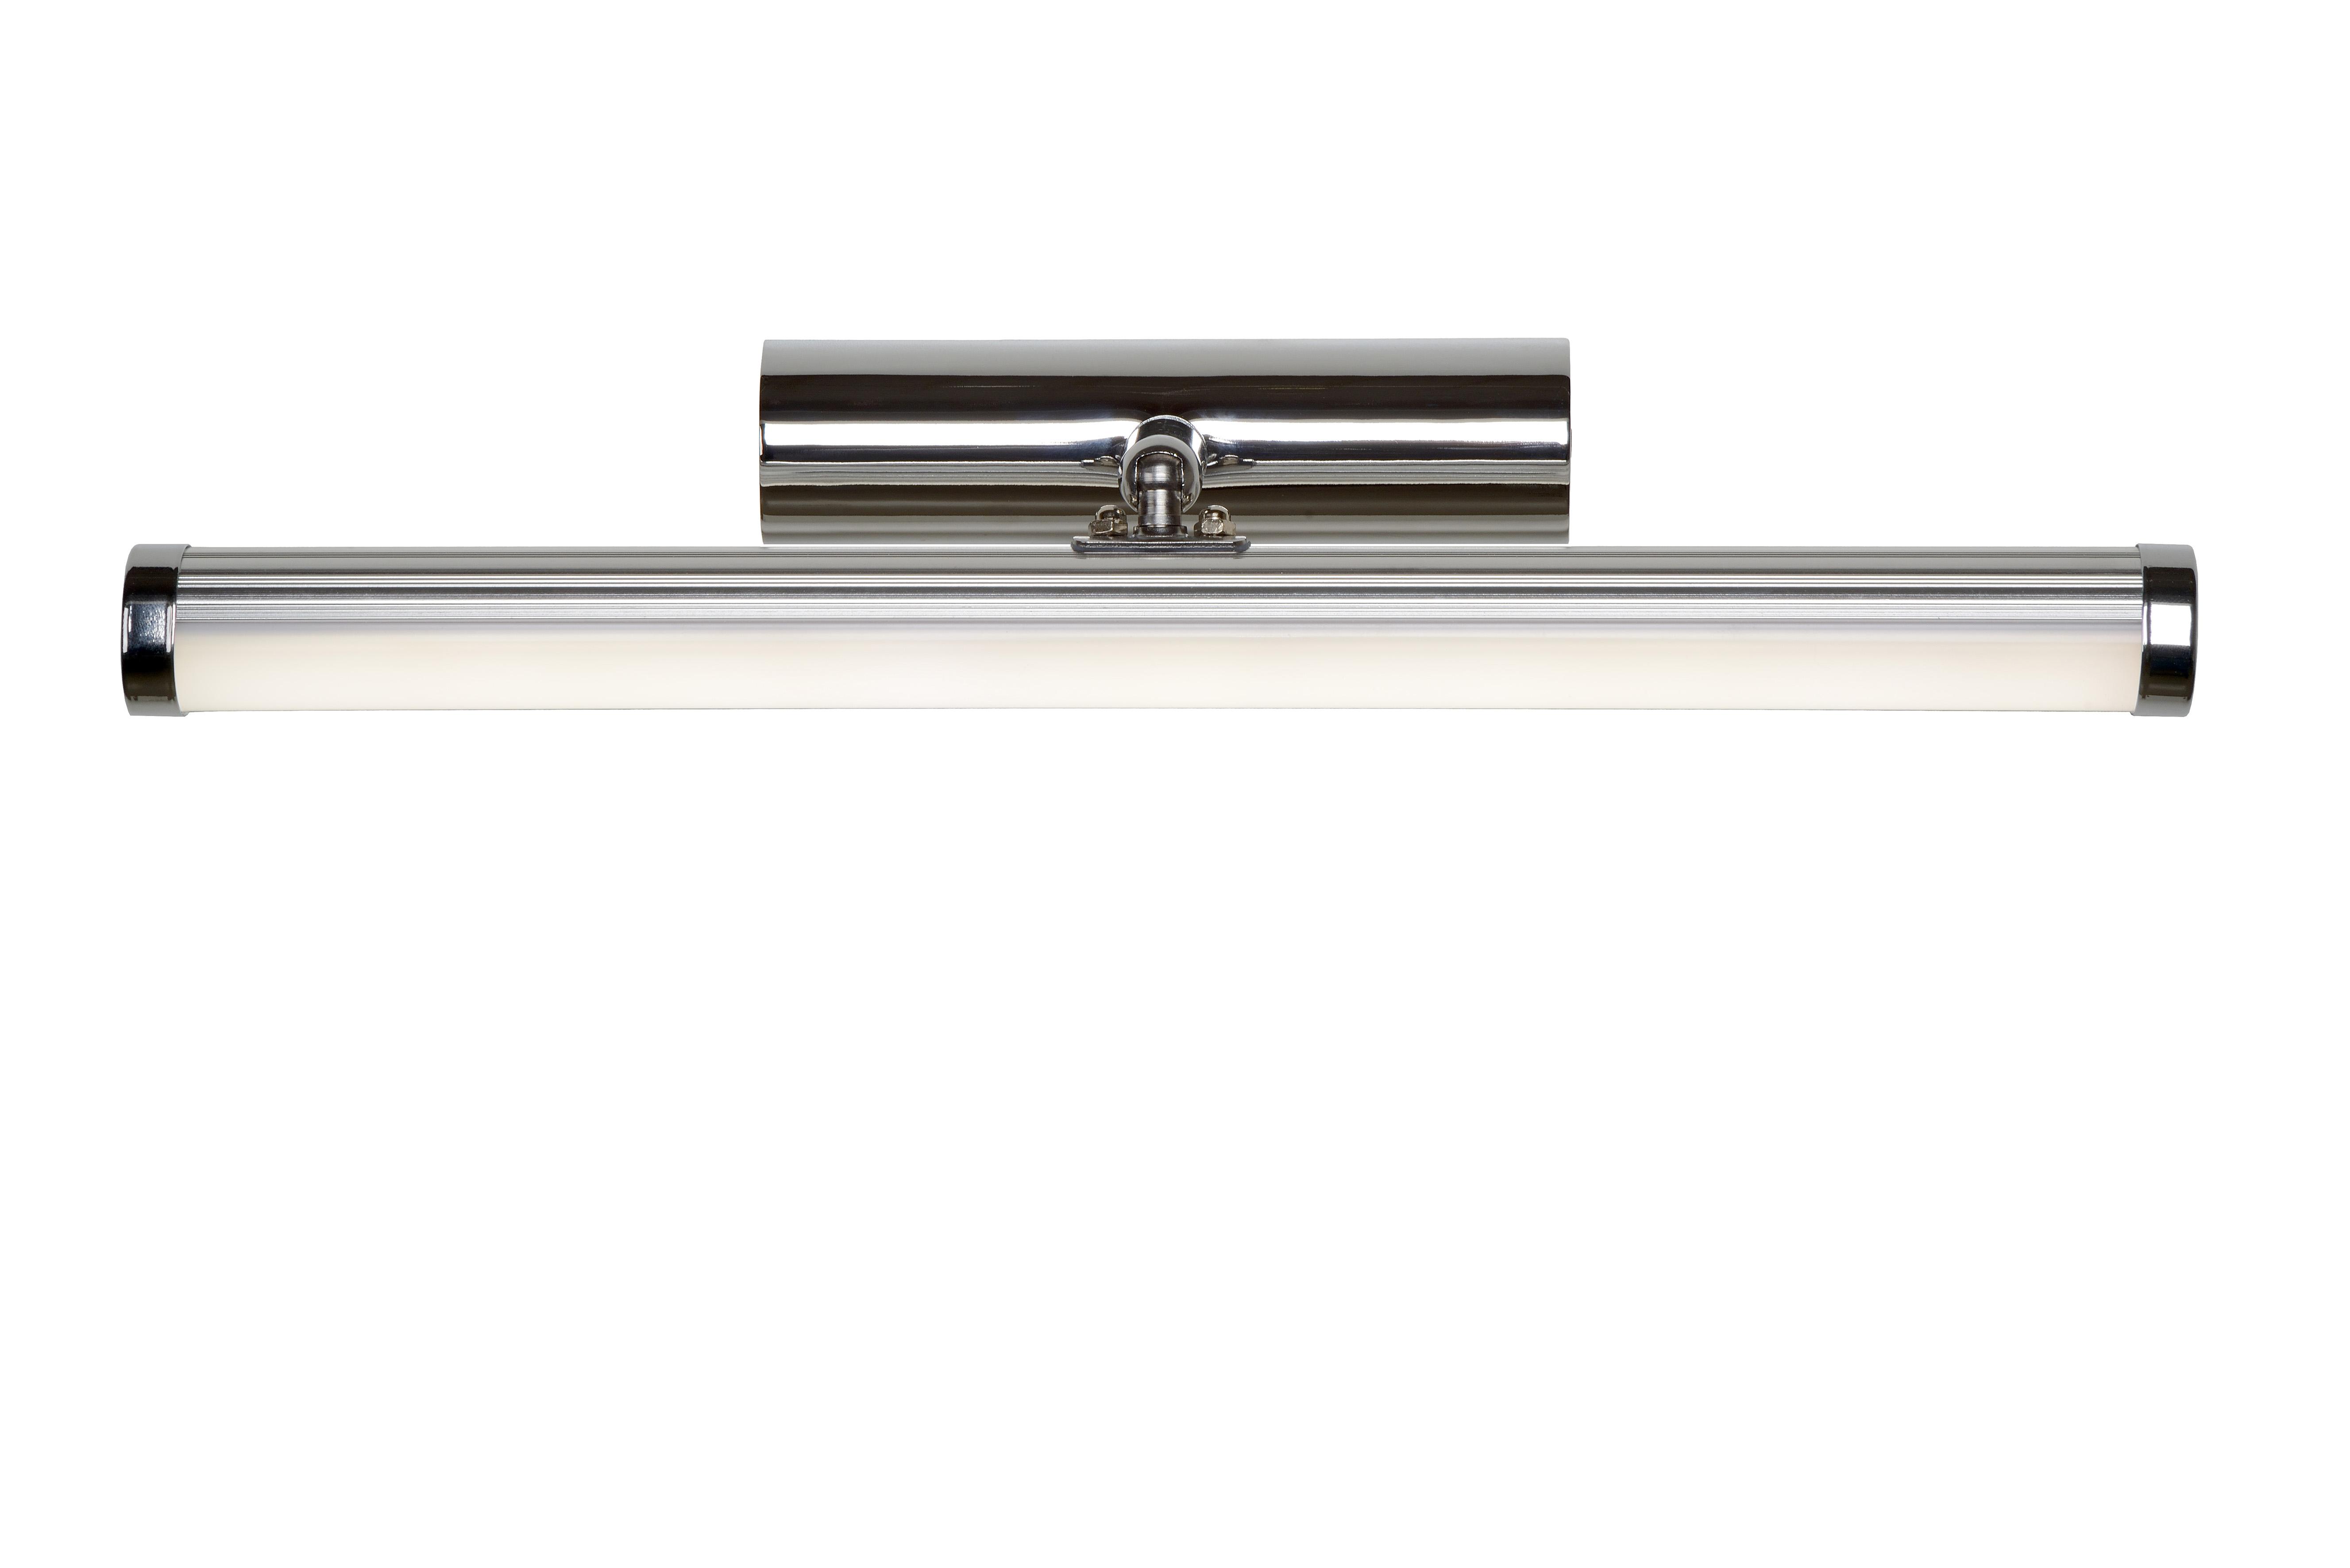 Spiegellamp Voor Badkamer : Belpa led spiegellamp badkamer led w k ip chroom